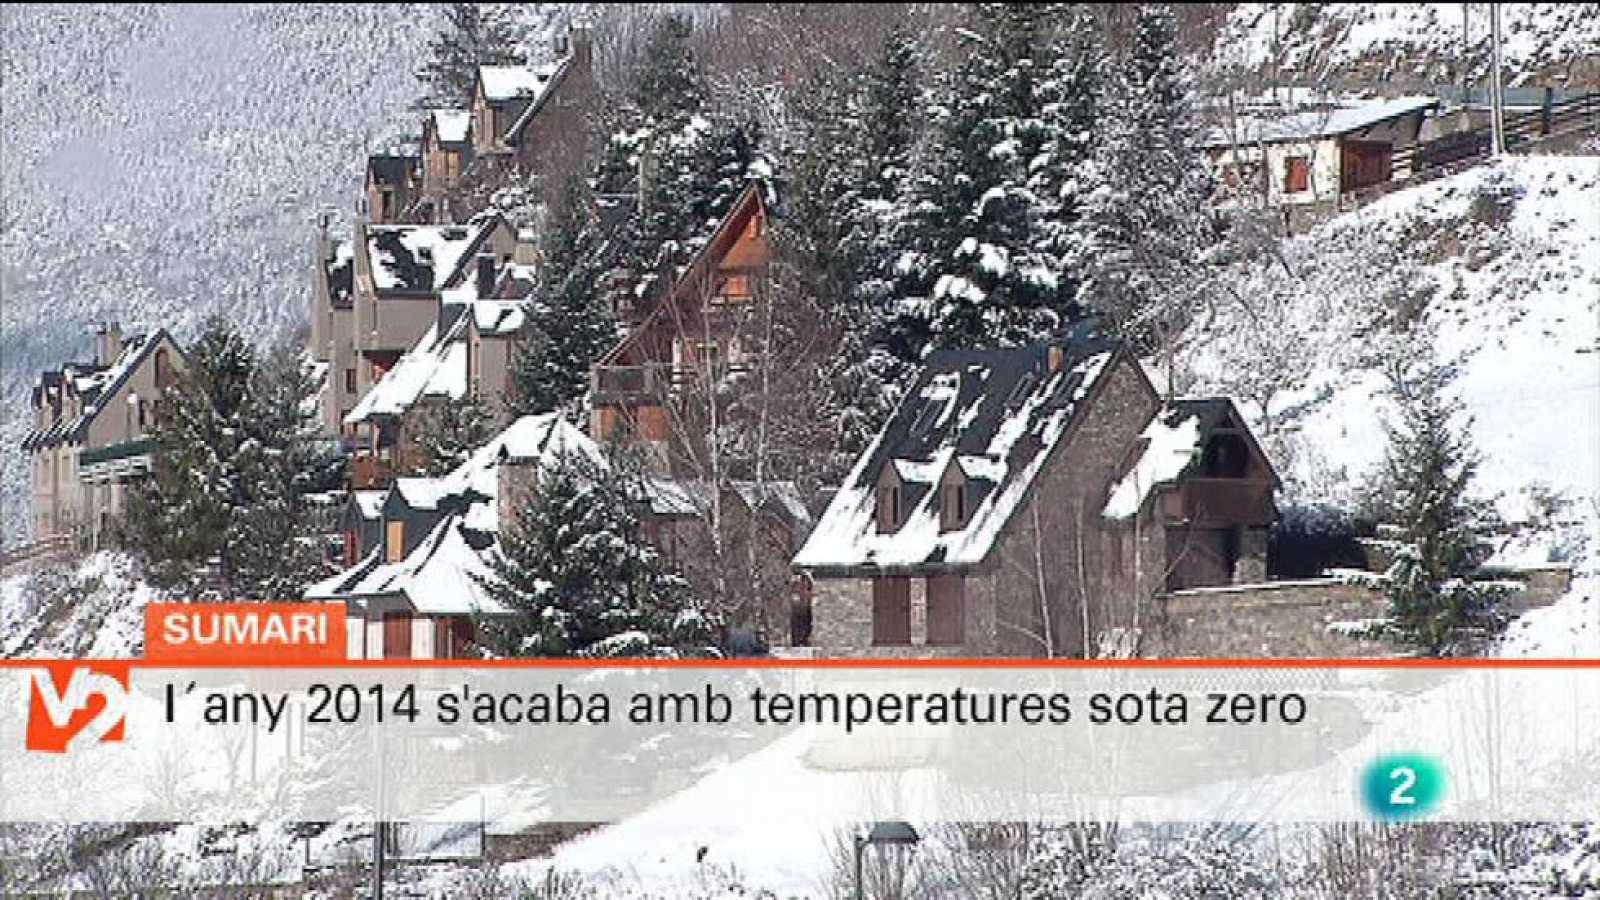 Vespre a La 2 - Informatiu - 29/12/2014